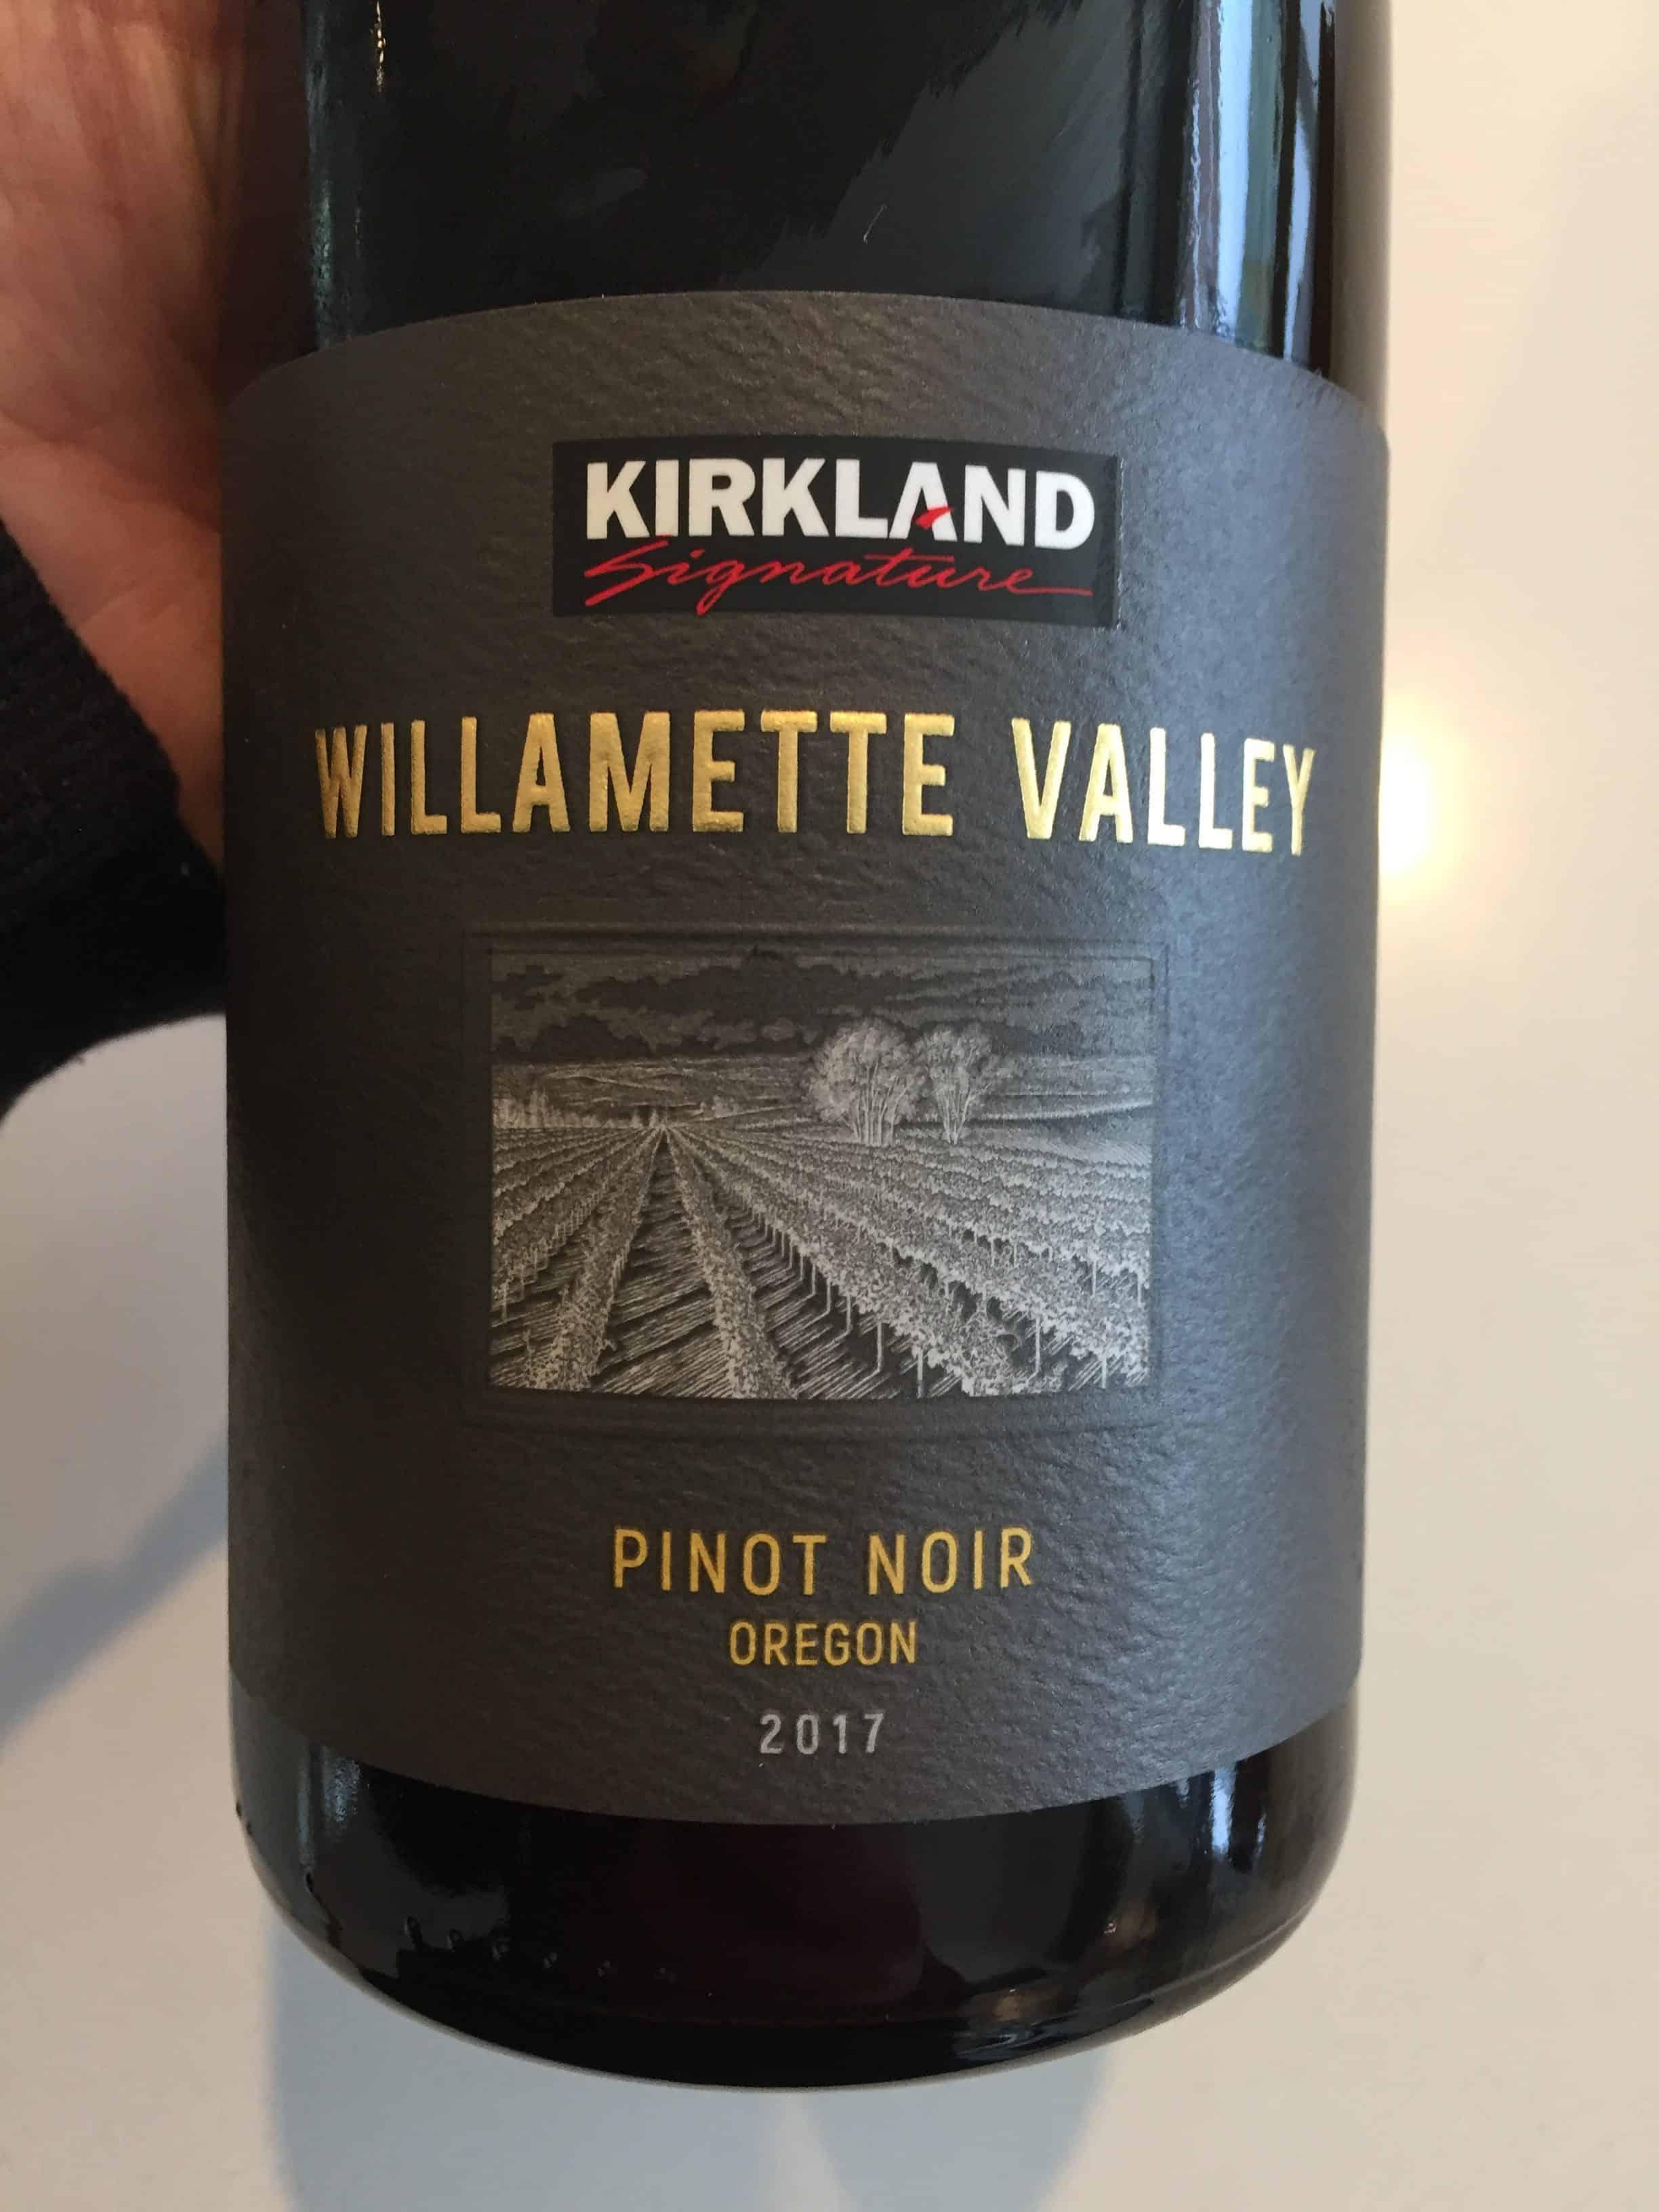 Front label of Kirkland Signature Willamette Valley Pinot Noir 2017